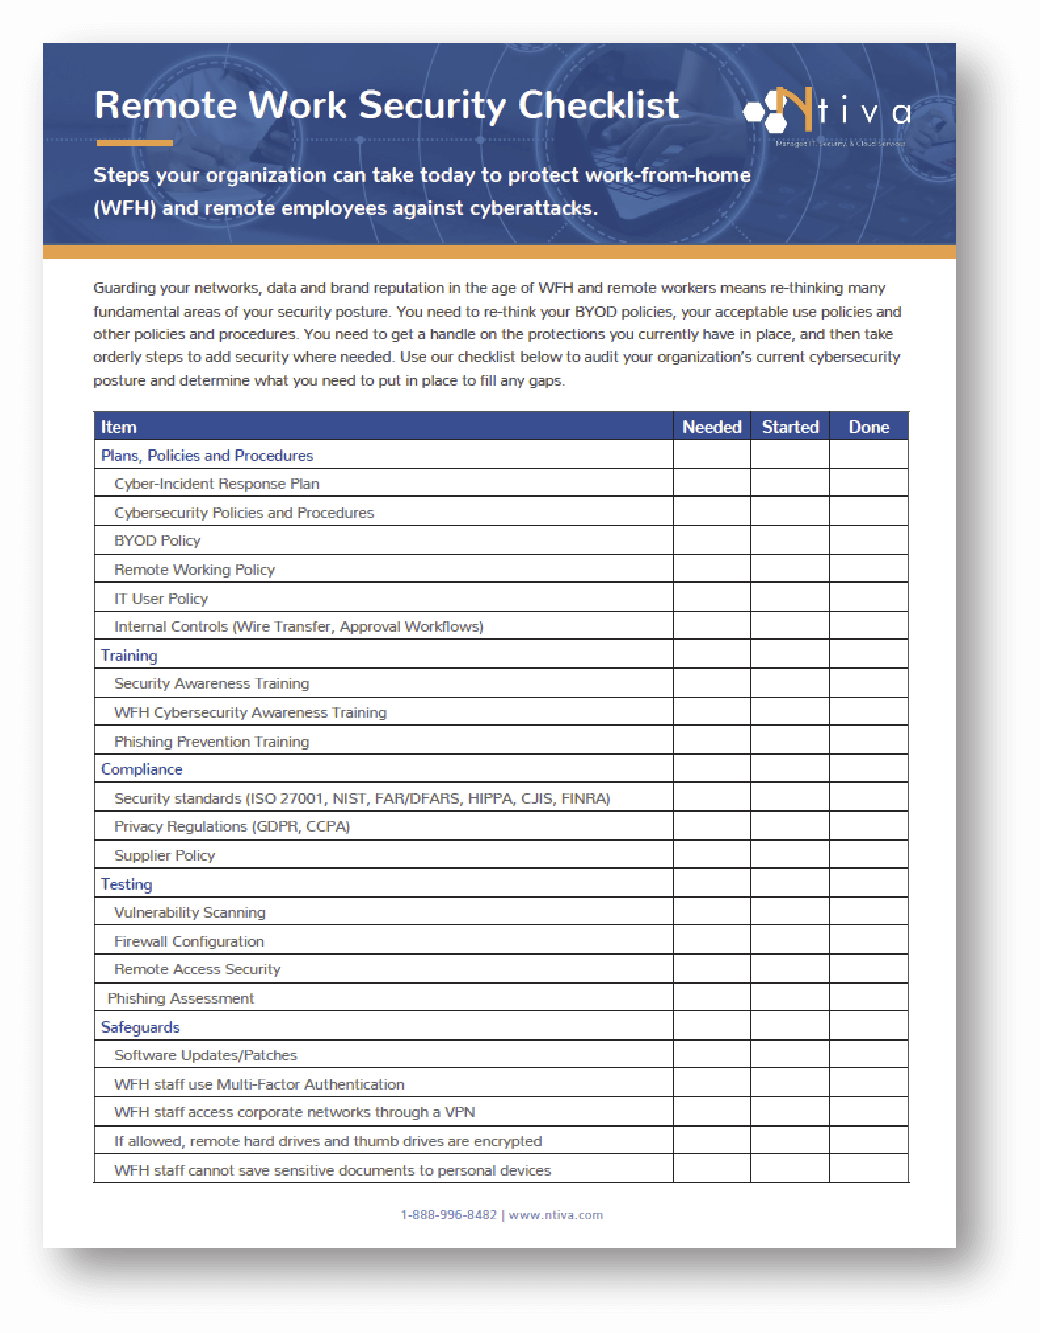 Remote Work Security Checklist